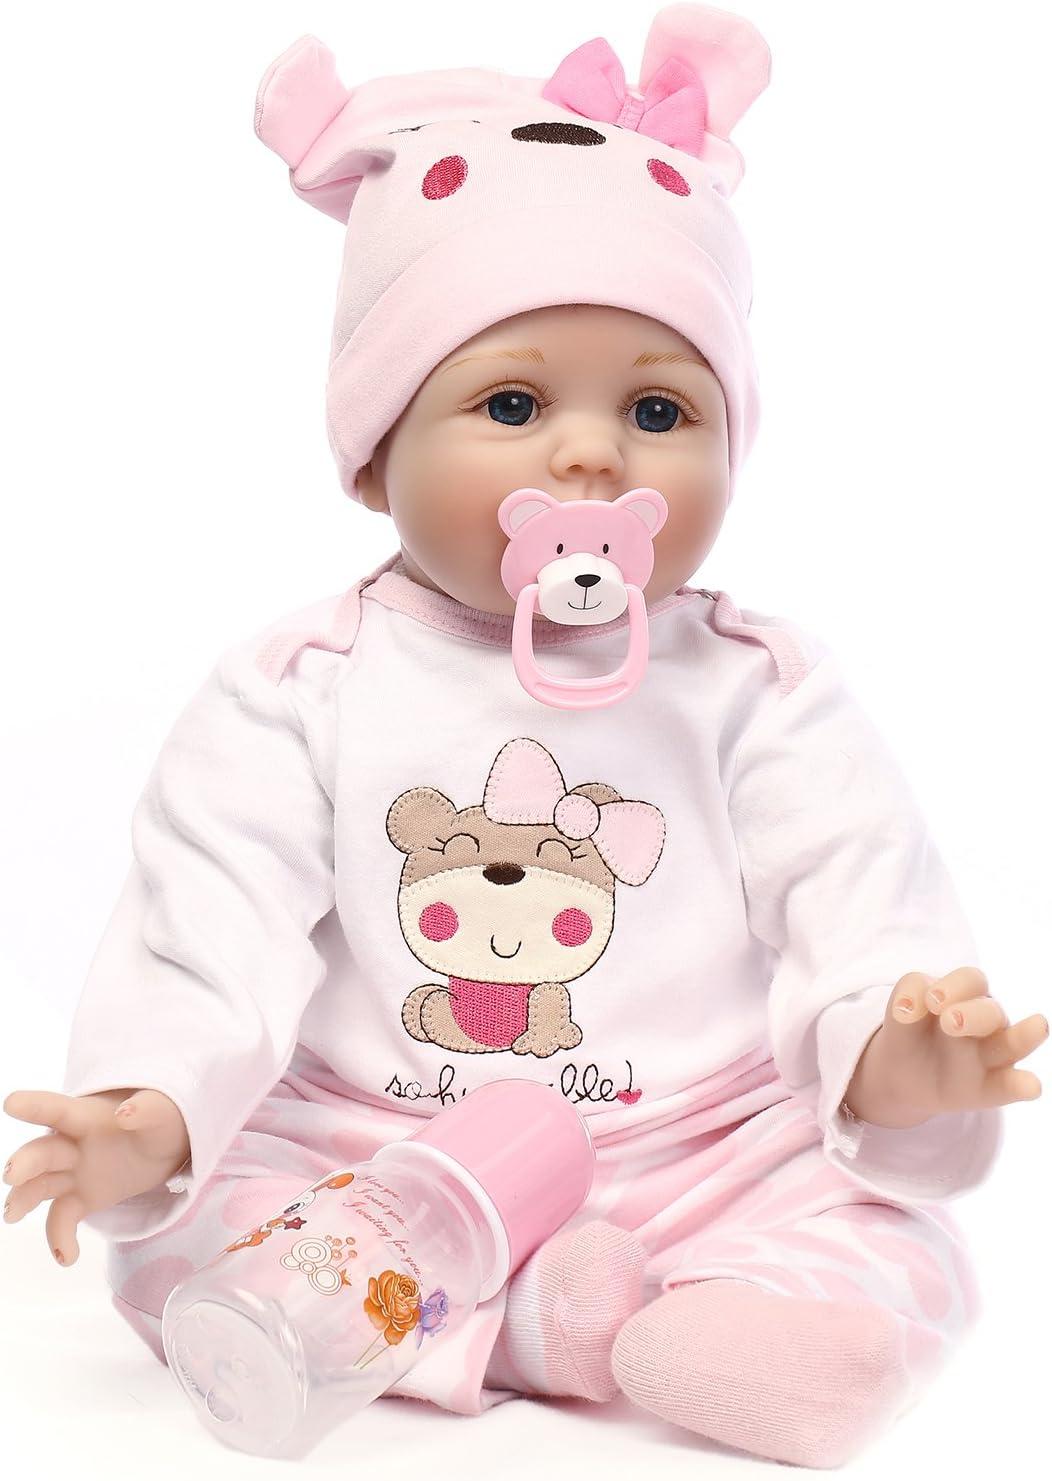 iCradle Reborn Baby Dolls Handmade 22//55cm Reborn Doll Baby Girl Very Lifelike Soft Silicone Reborn Dolls Toddler Child Growth Partner Xmas Gift